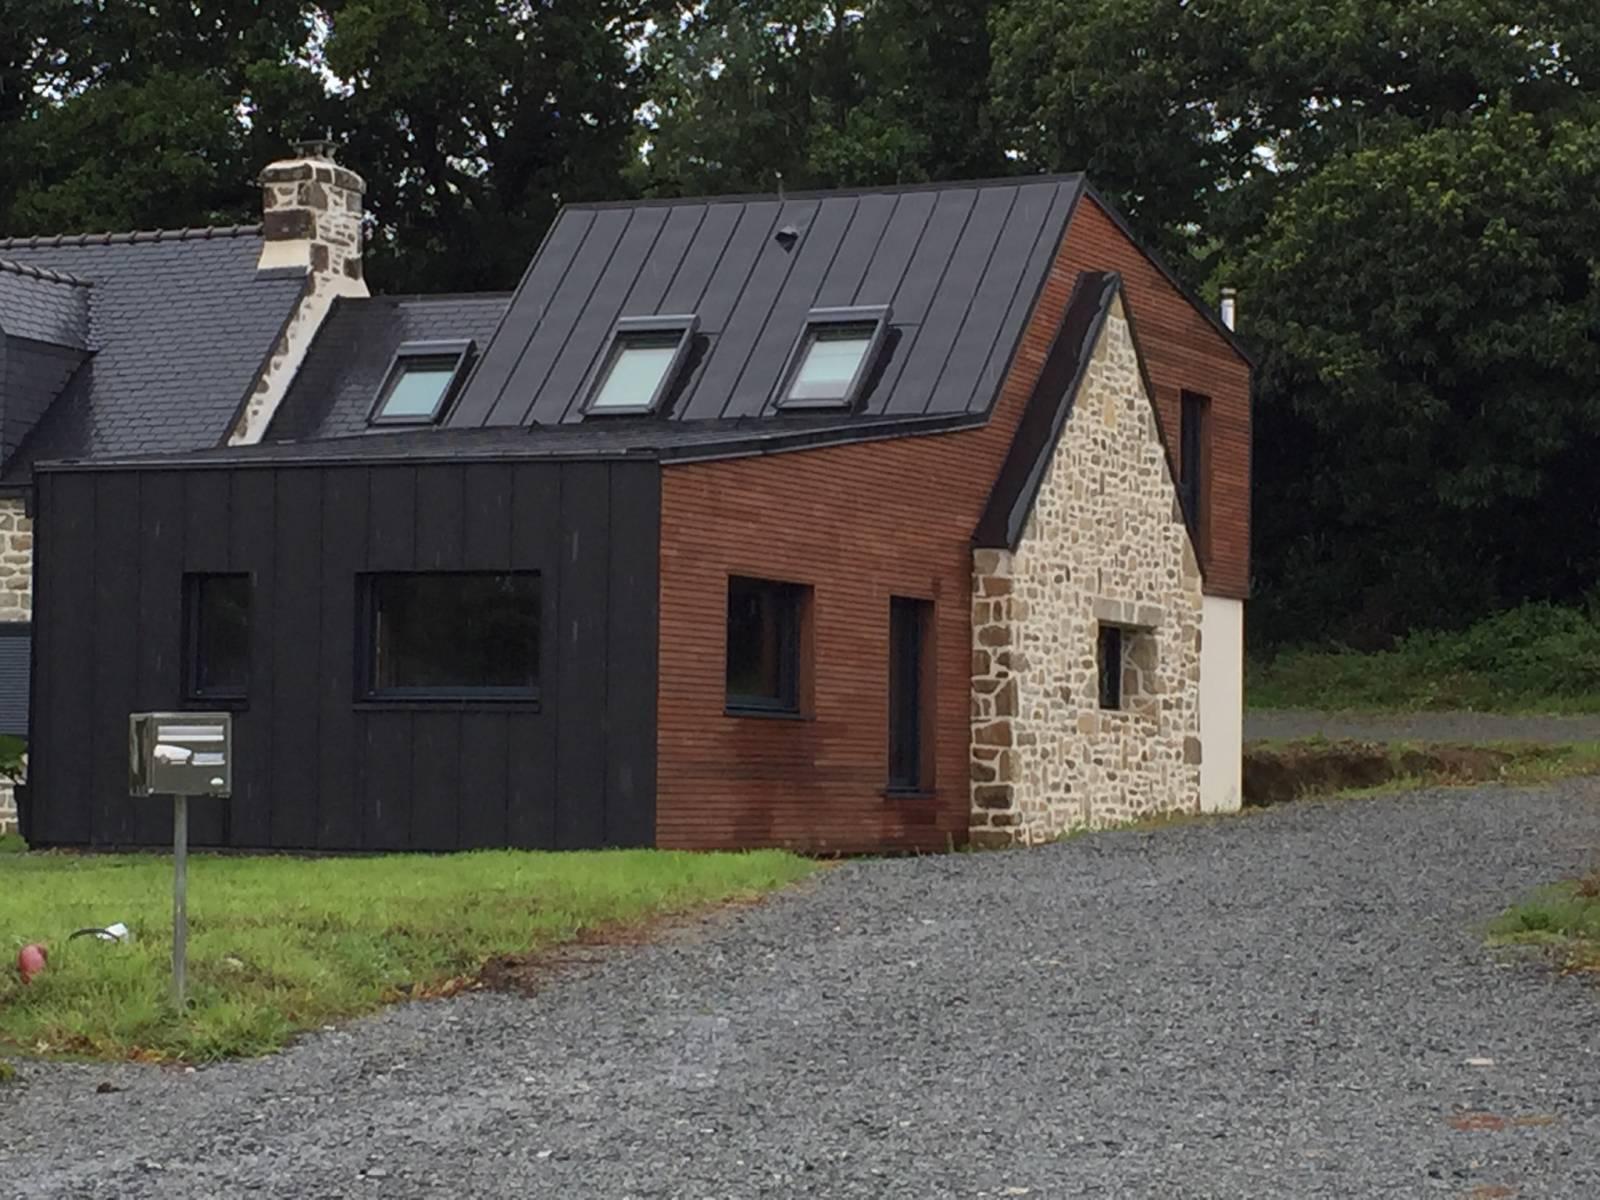 Maison en bois gironde ventana blog for Meison construction